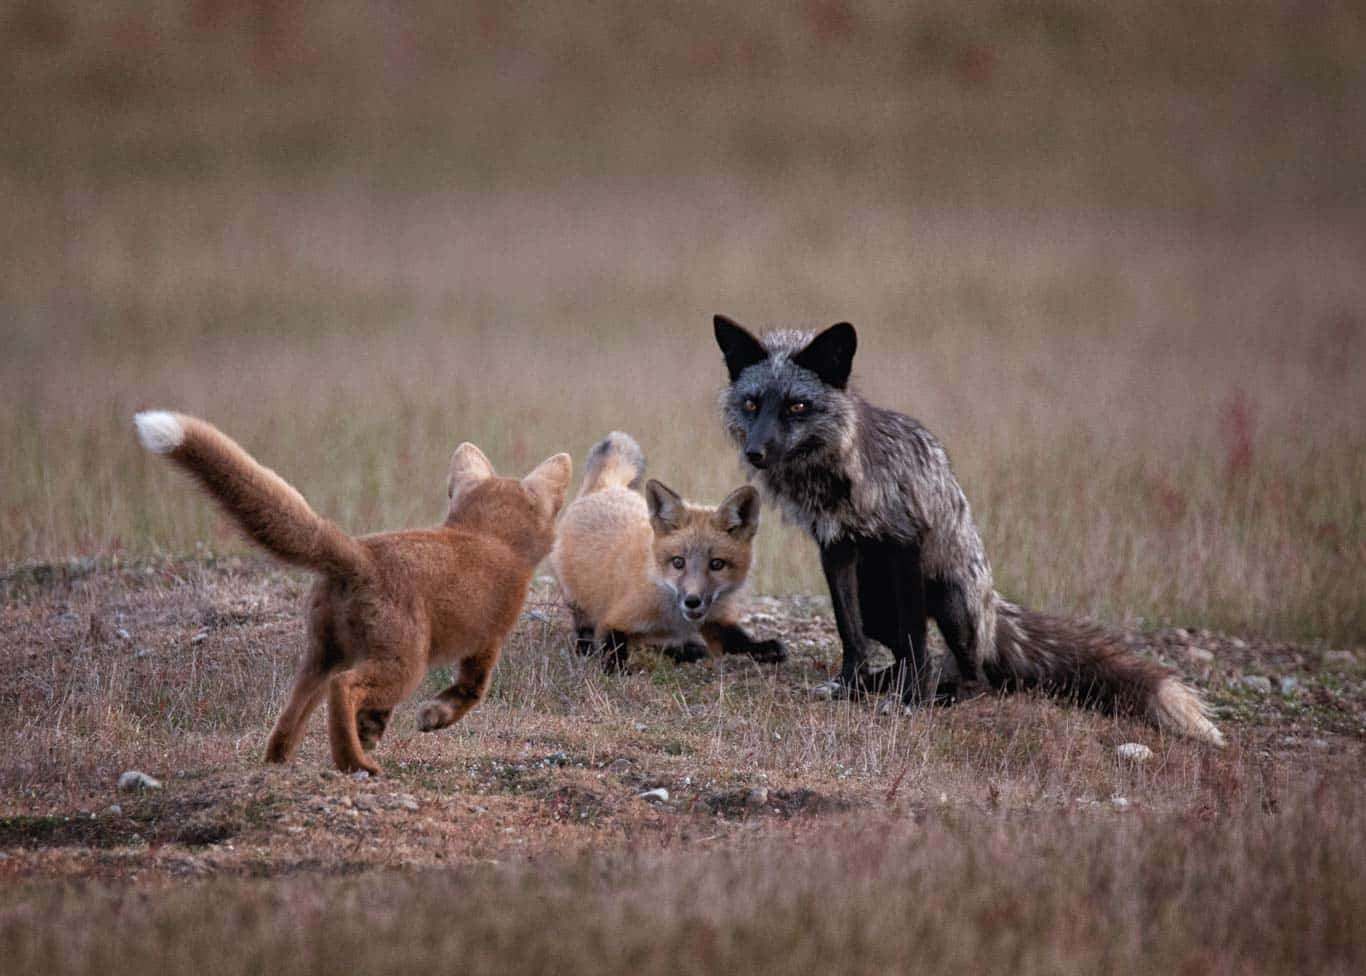 Fox and Fox Kits Playing